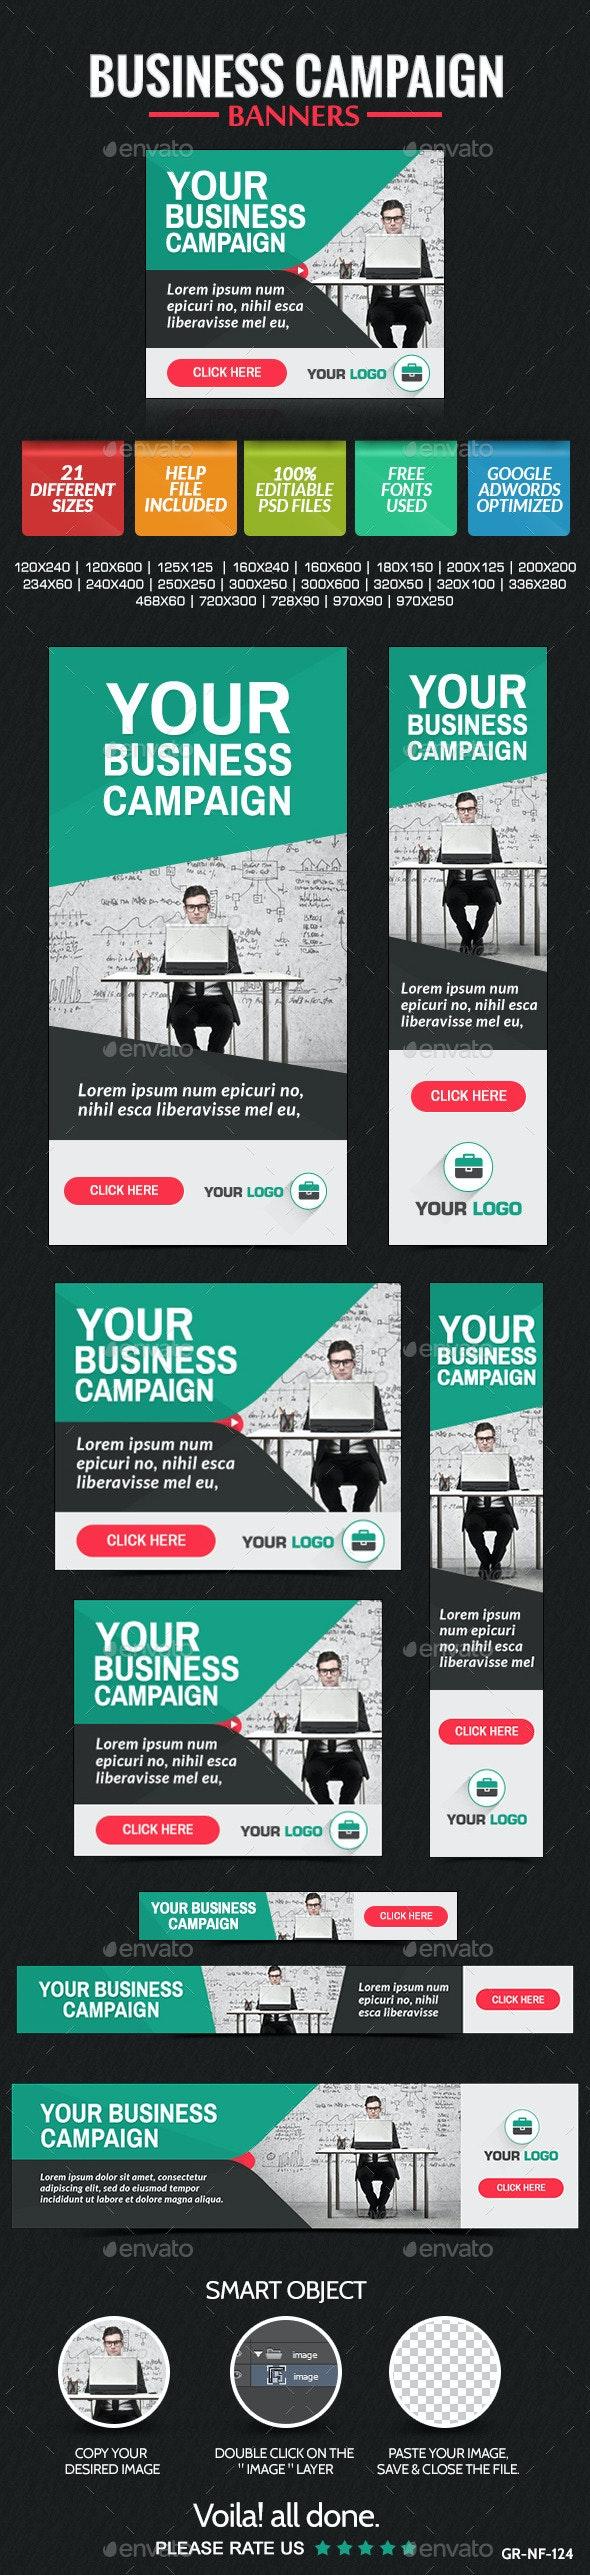 Business Banner Design Set - Banners & Ads Web Elements